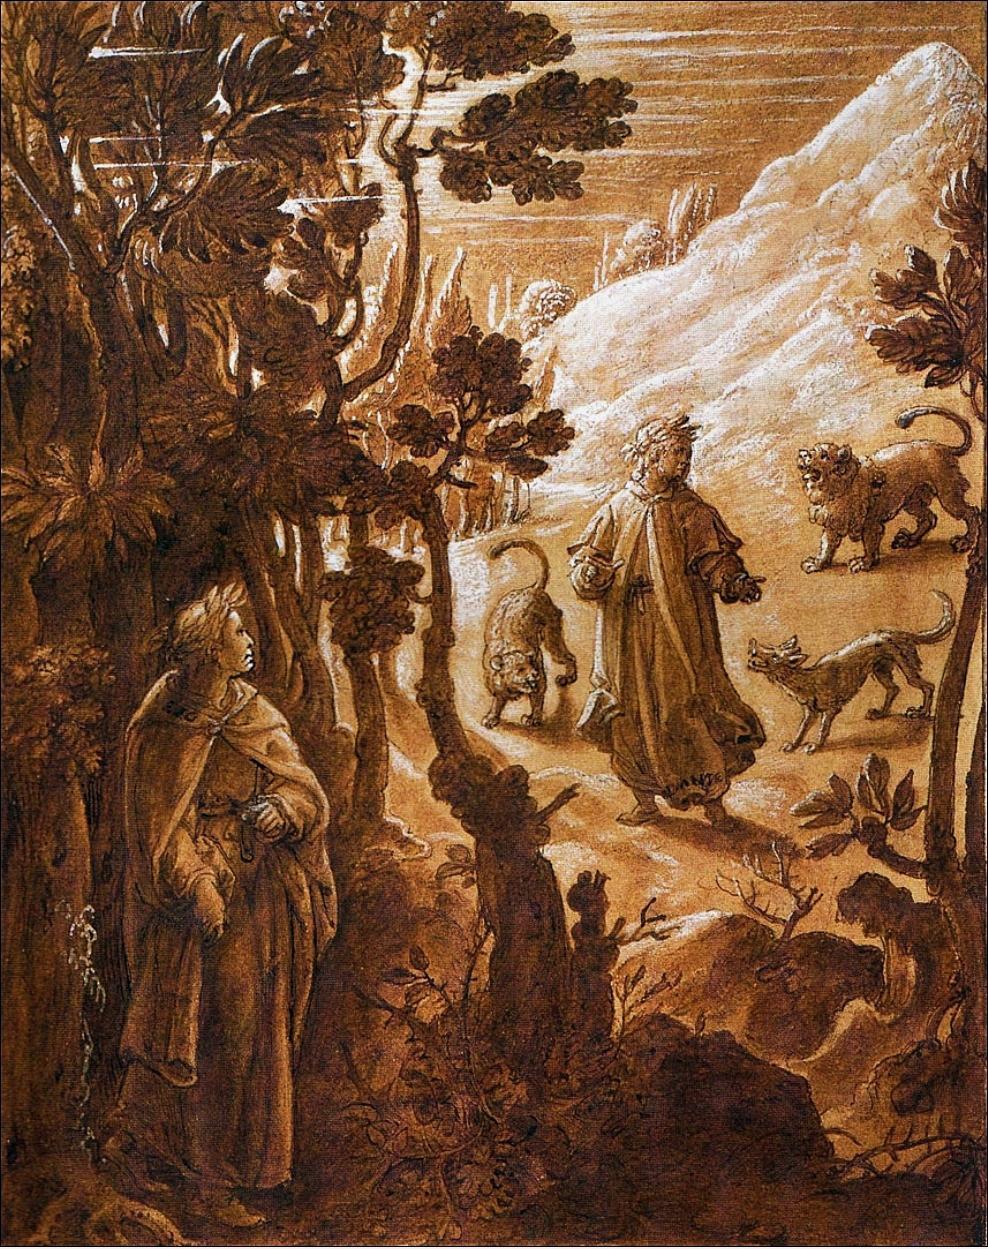 Jan van der Straet (Giovanni Stradano), Dante fugge le tre bestie, Inferno Canto I.